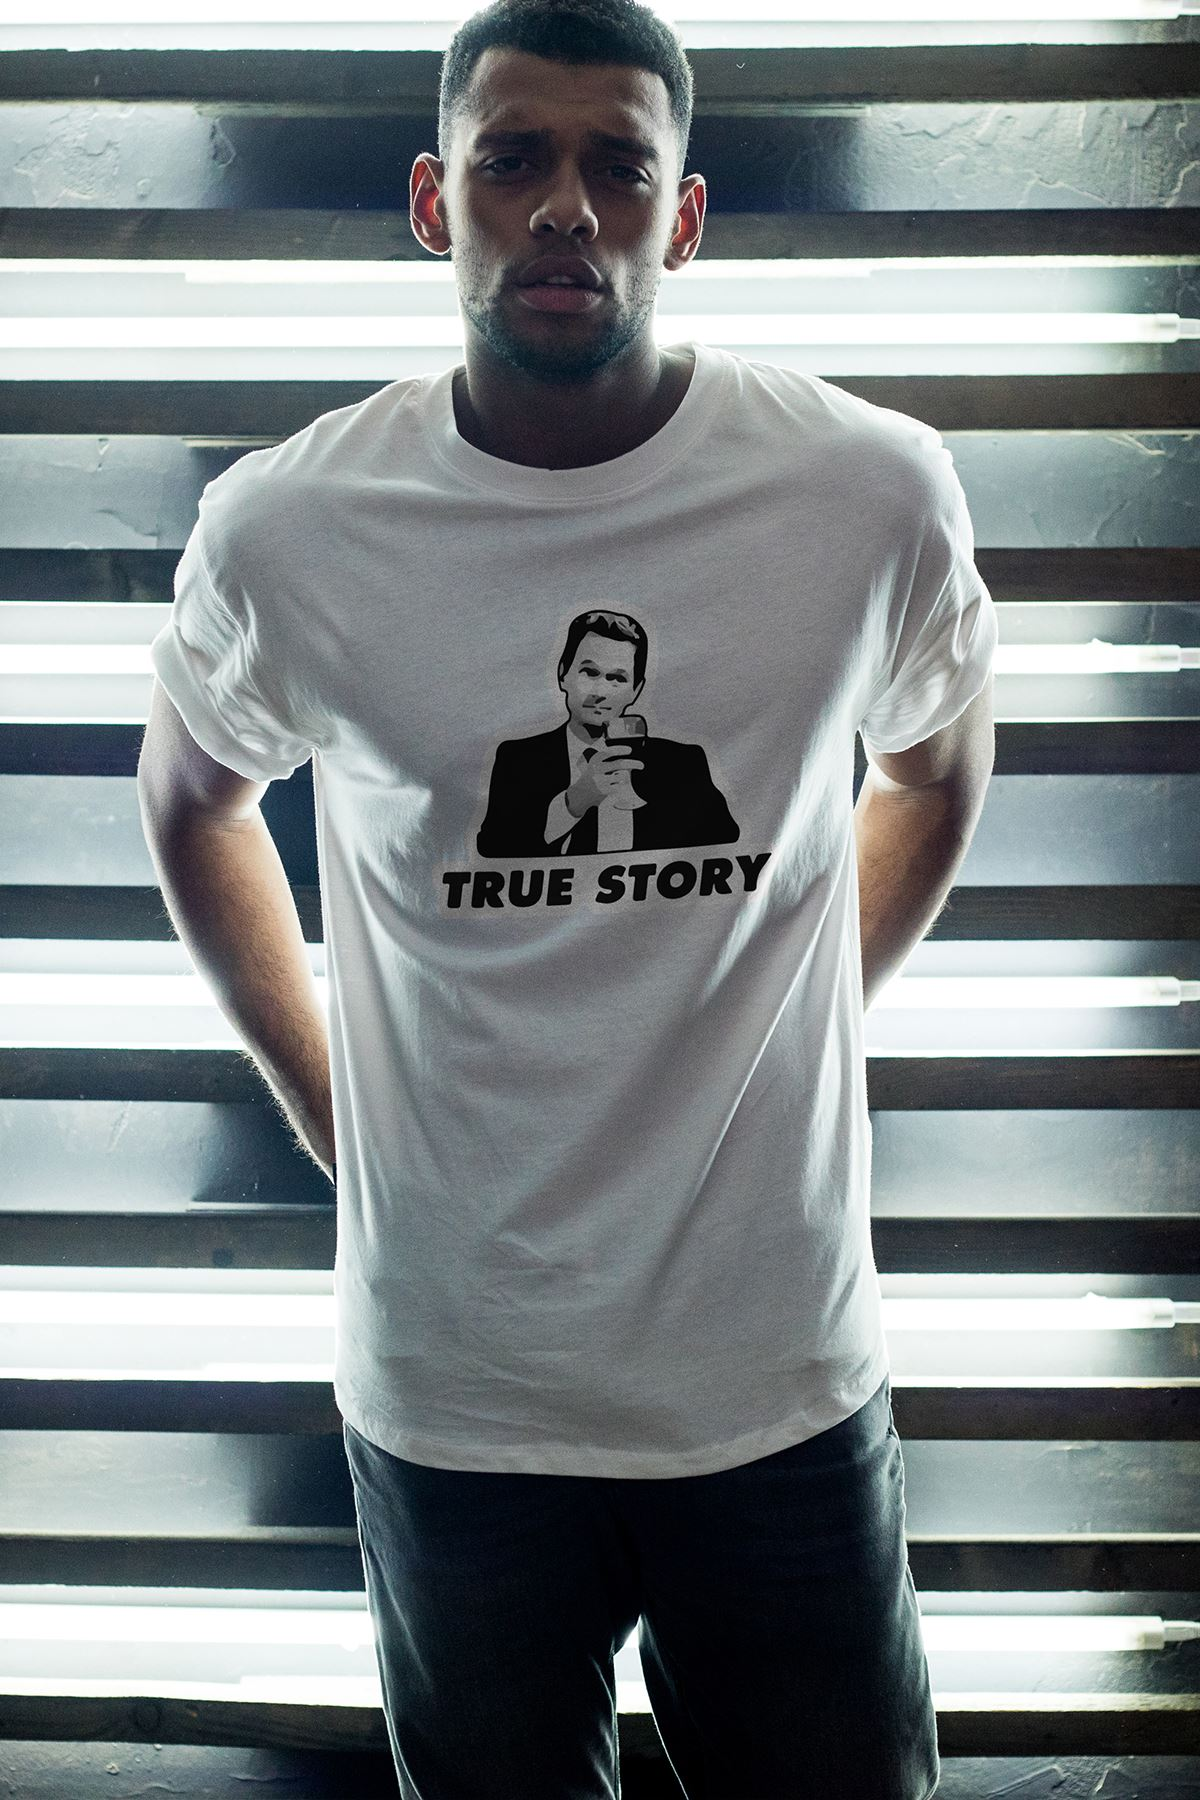 True Story Beyaz Erkek Oversize Tshirt - Tişört